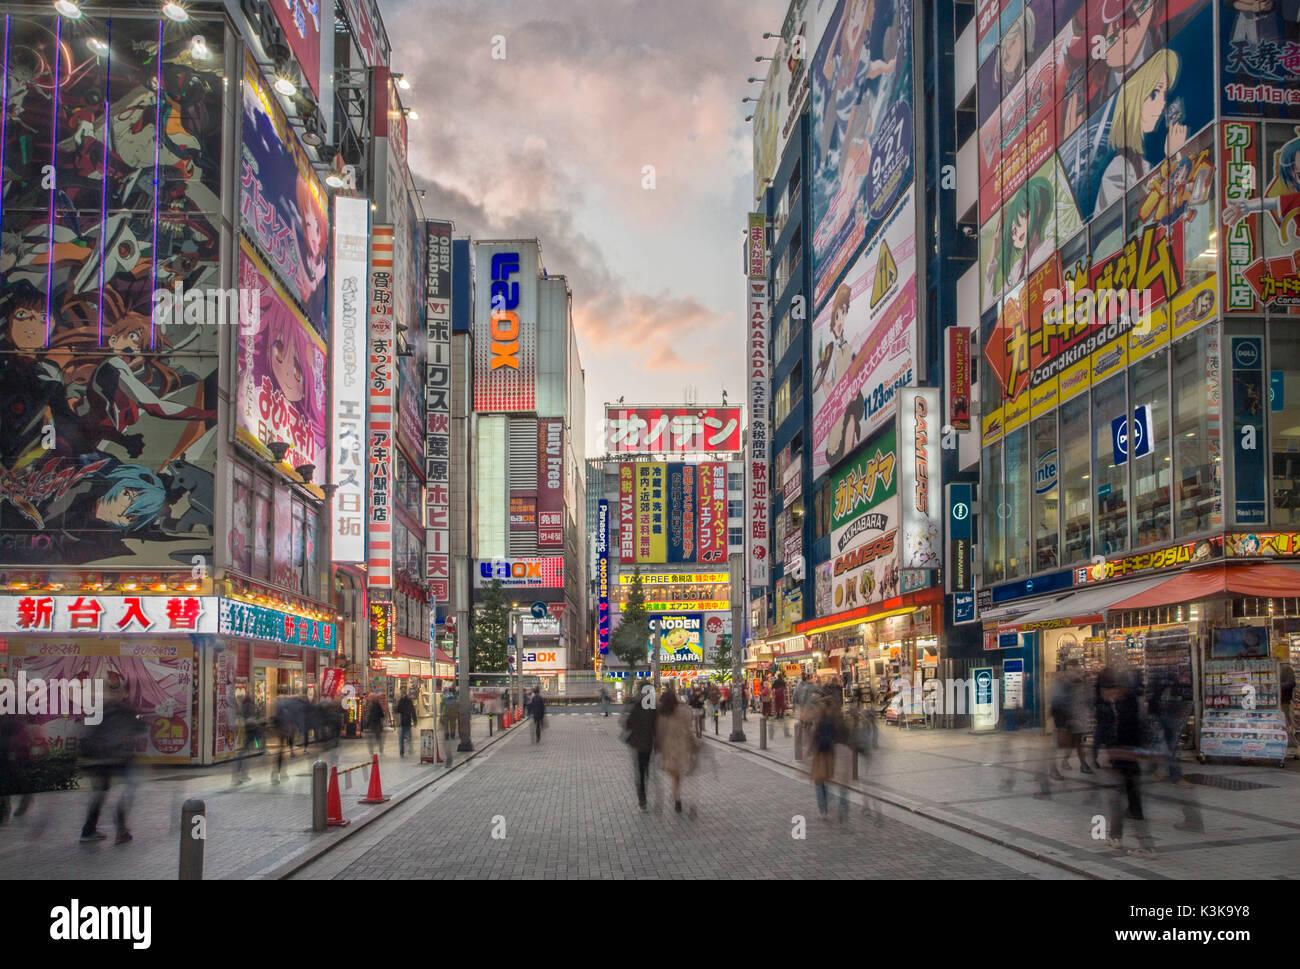 Le Japon, la ville de Tokyo, Akihabara Electric Town Photo Stock